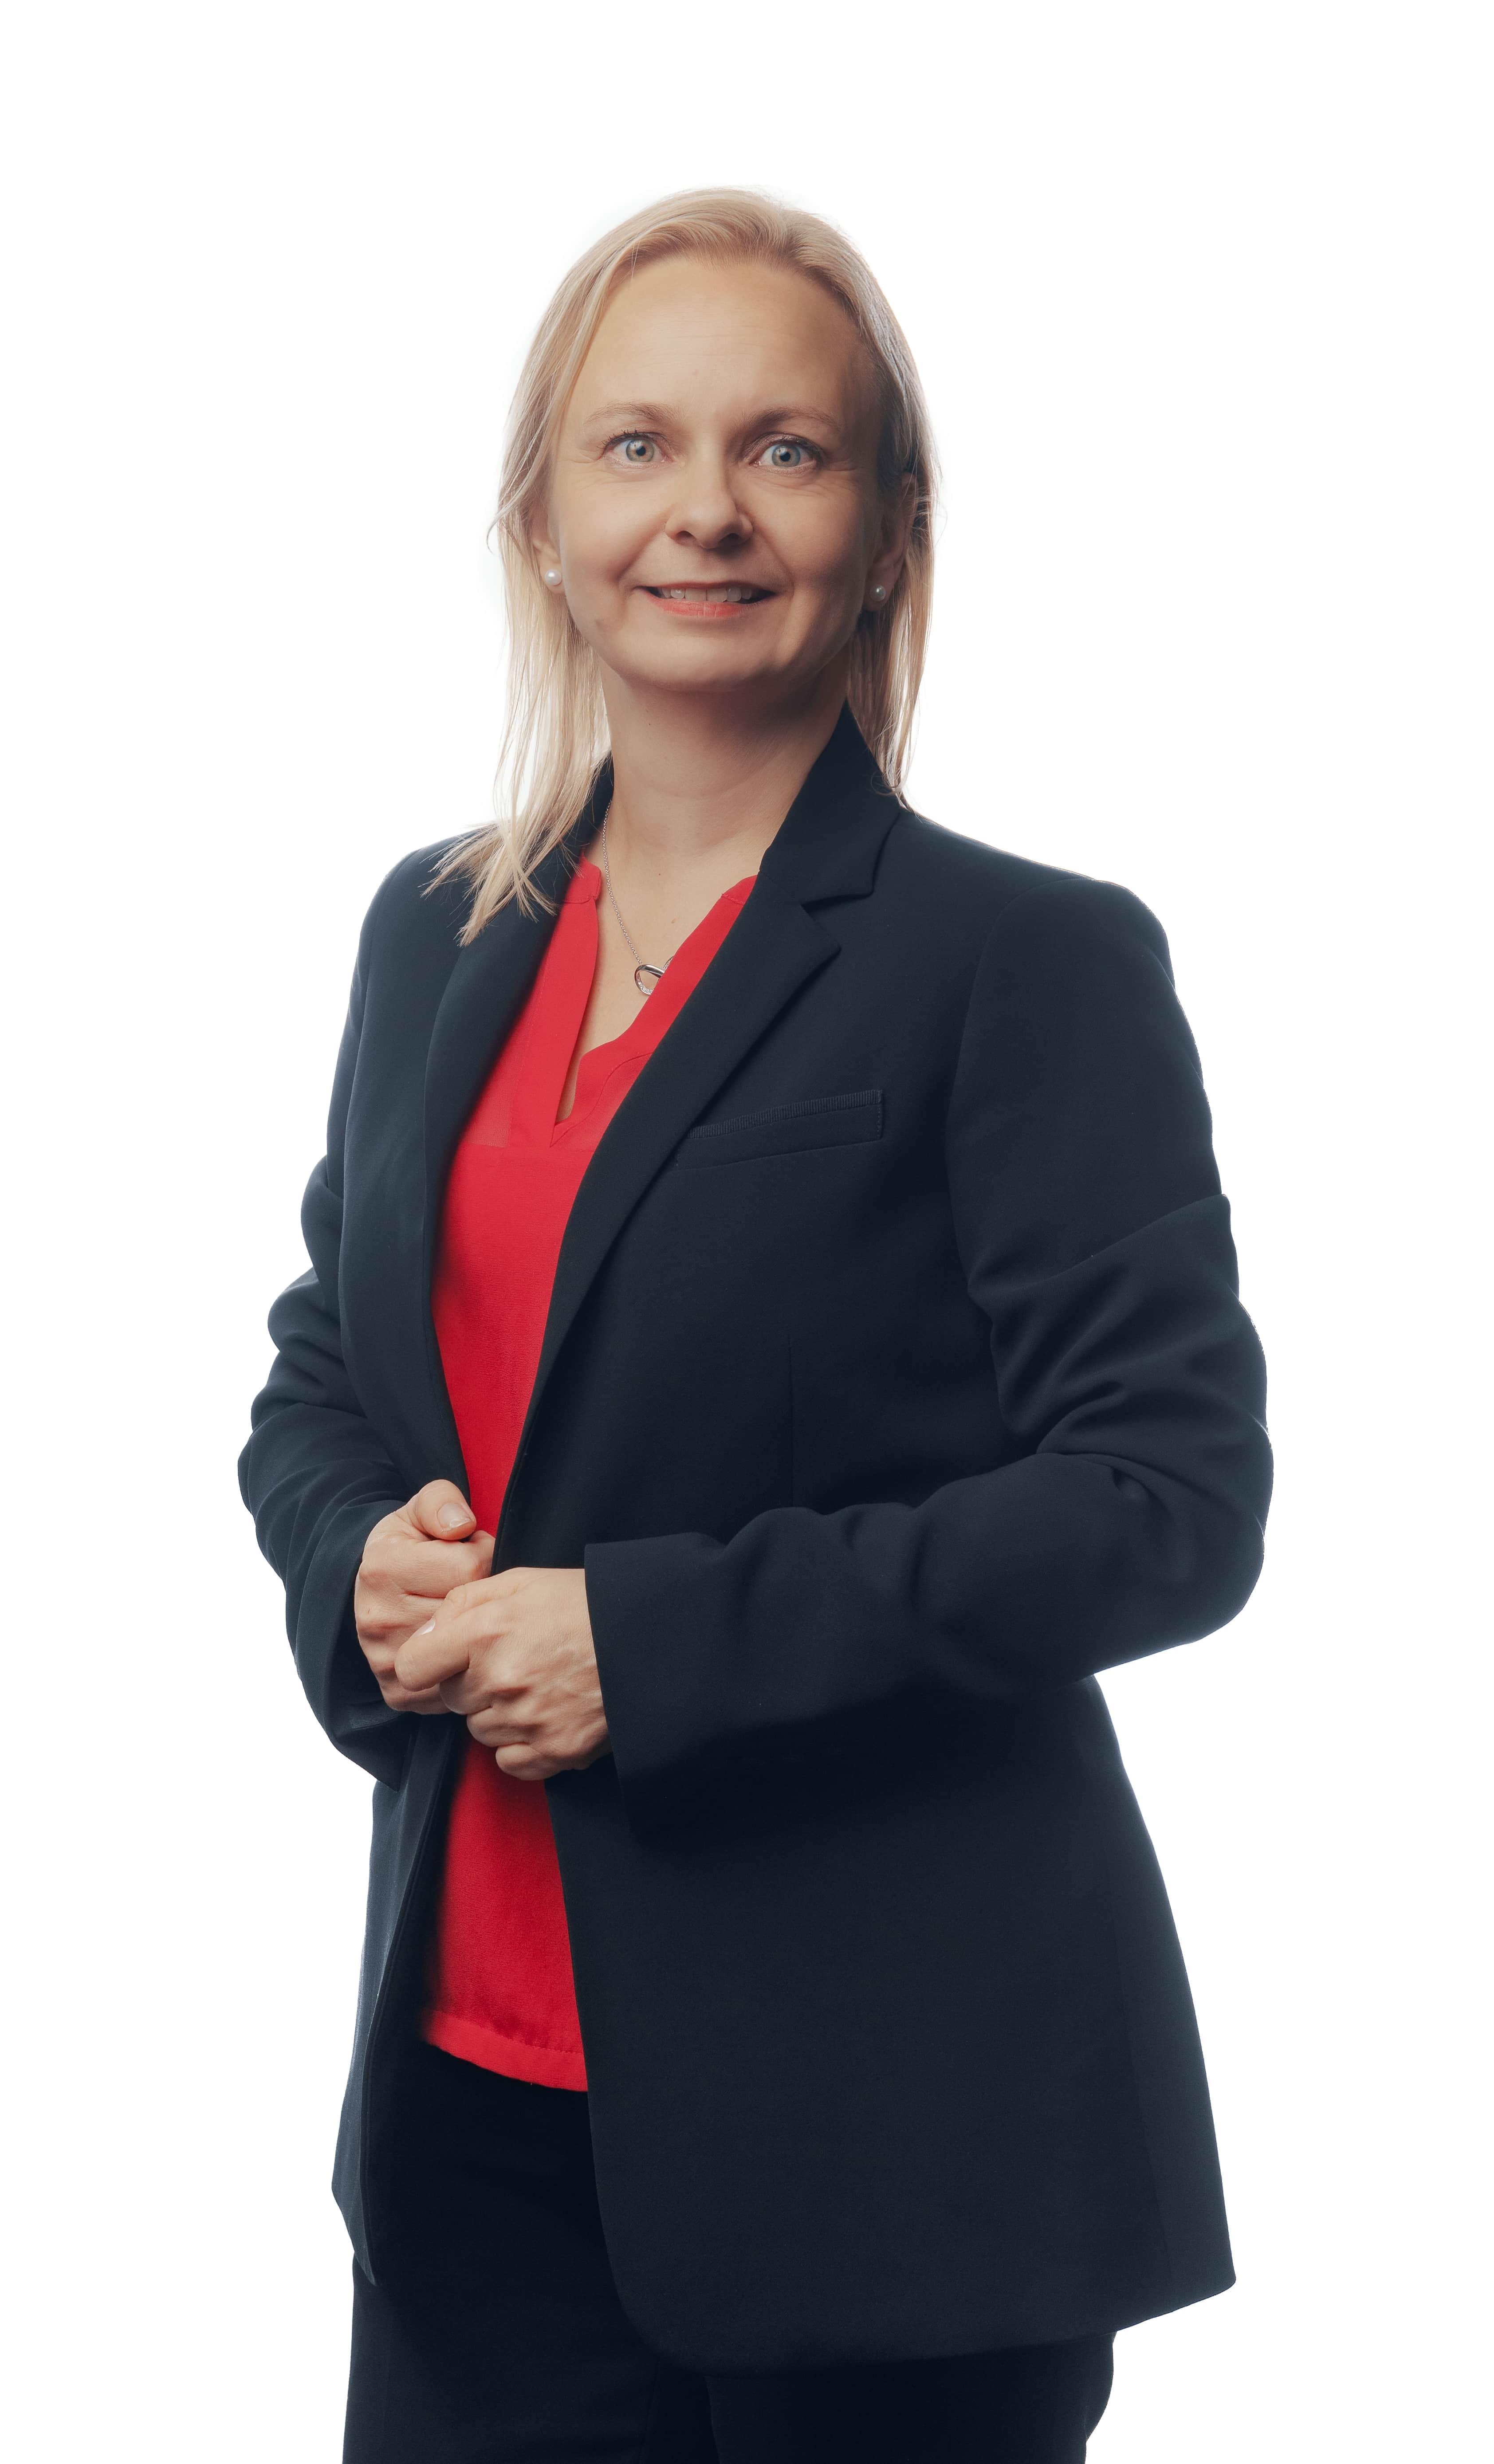 Ulla Lenkkeri-Schütz